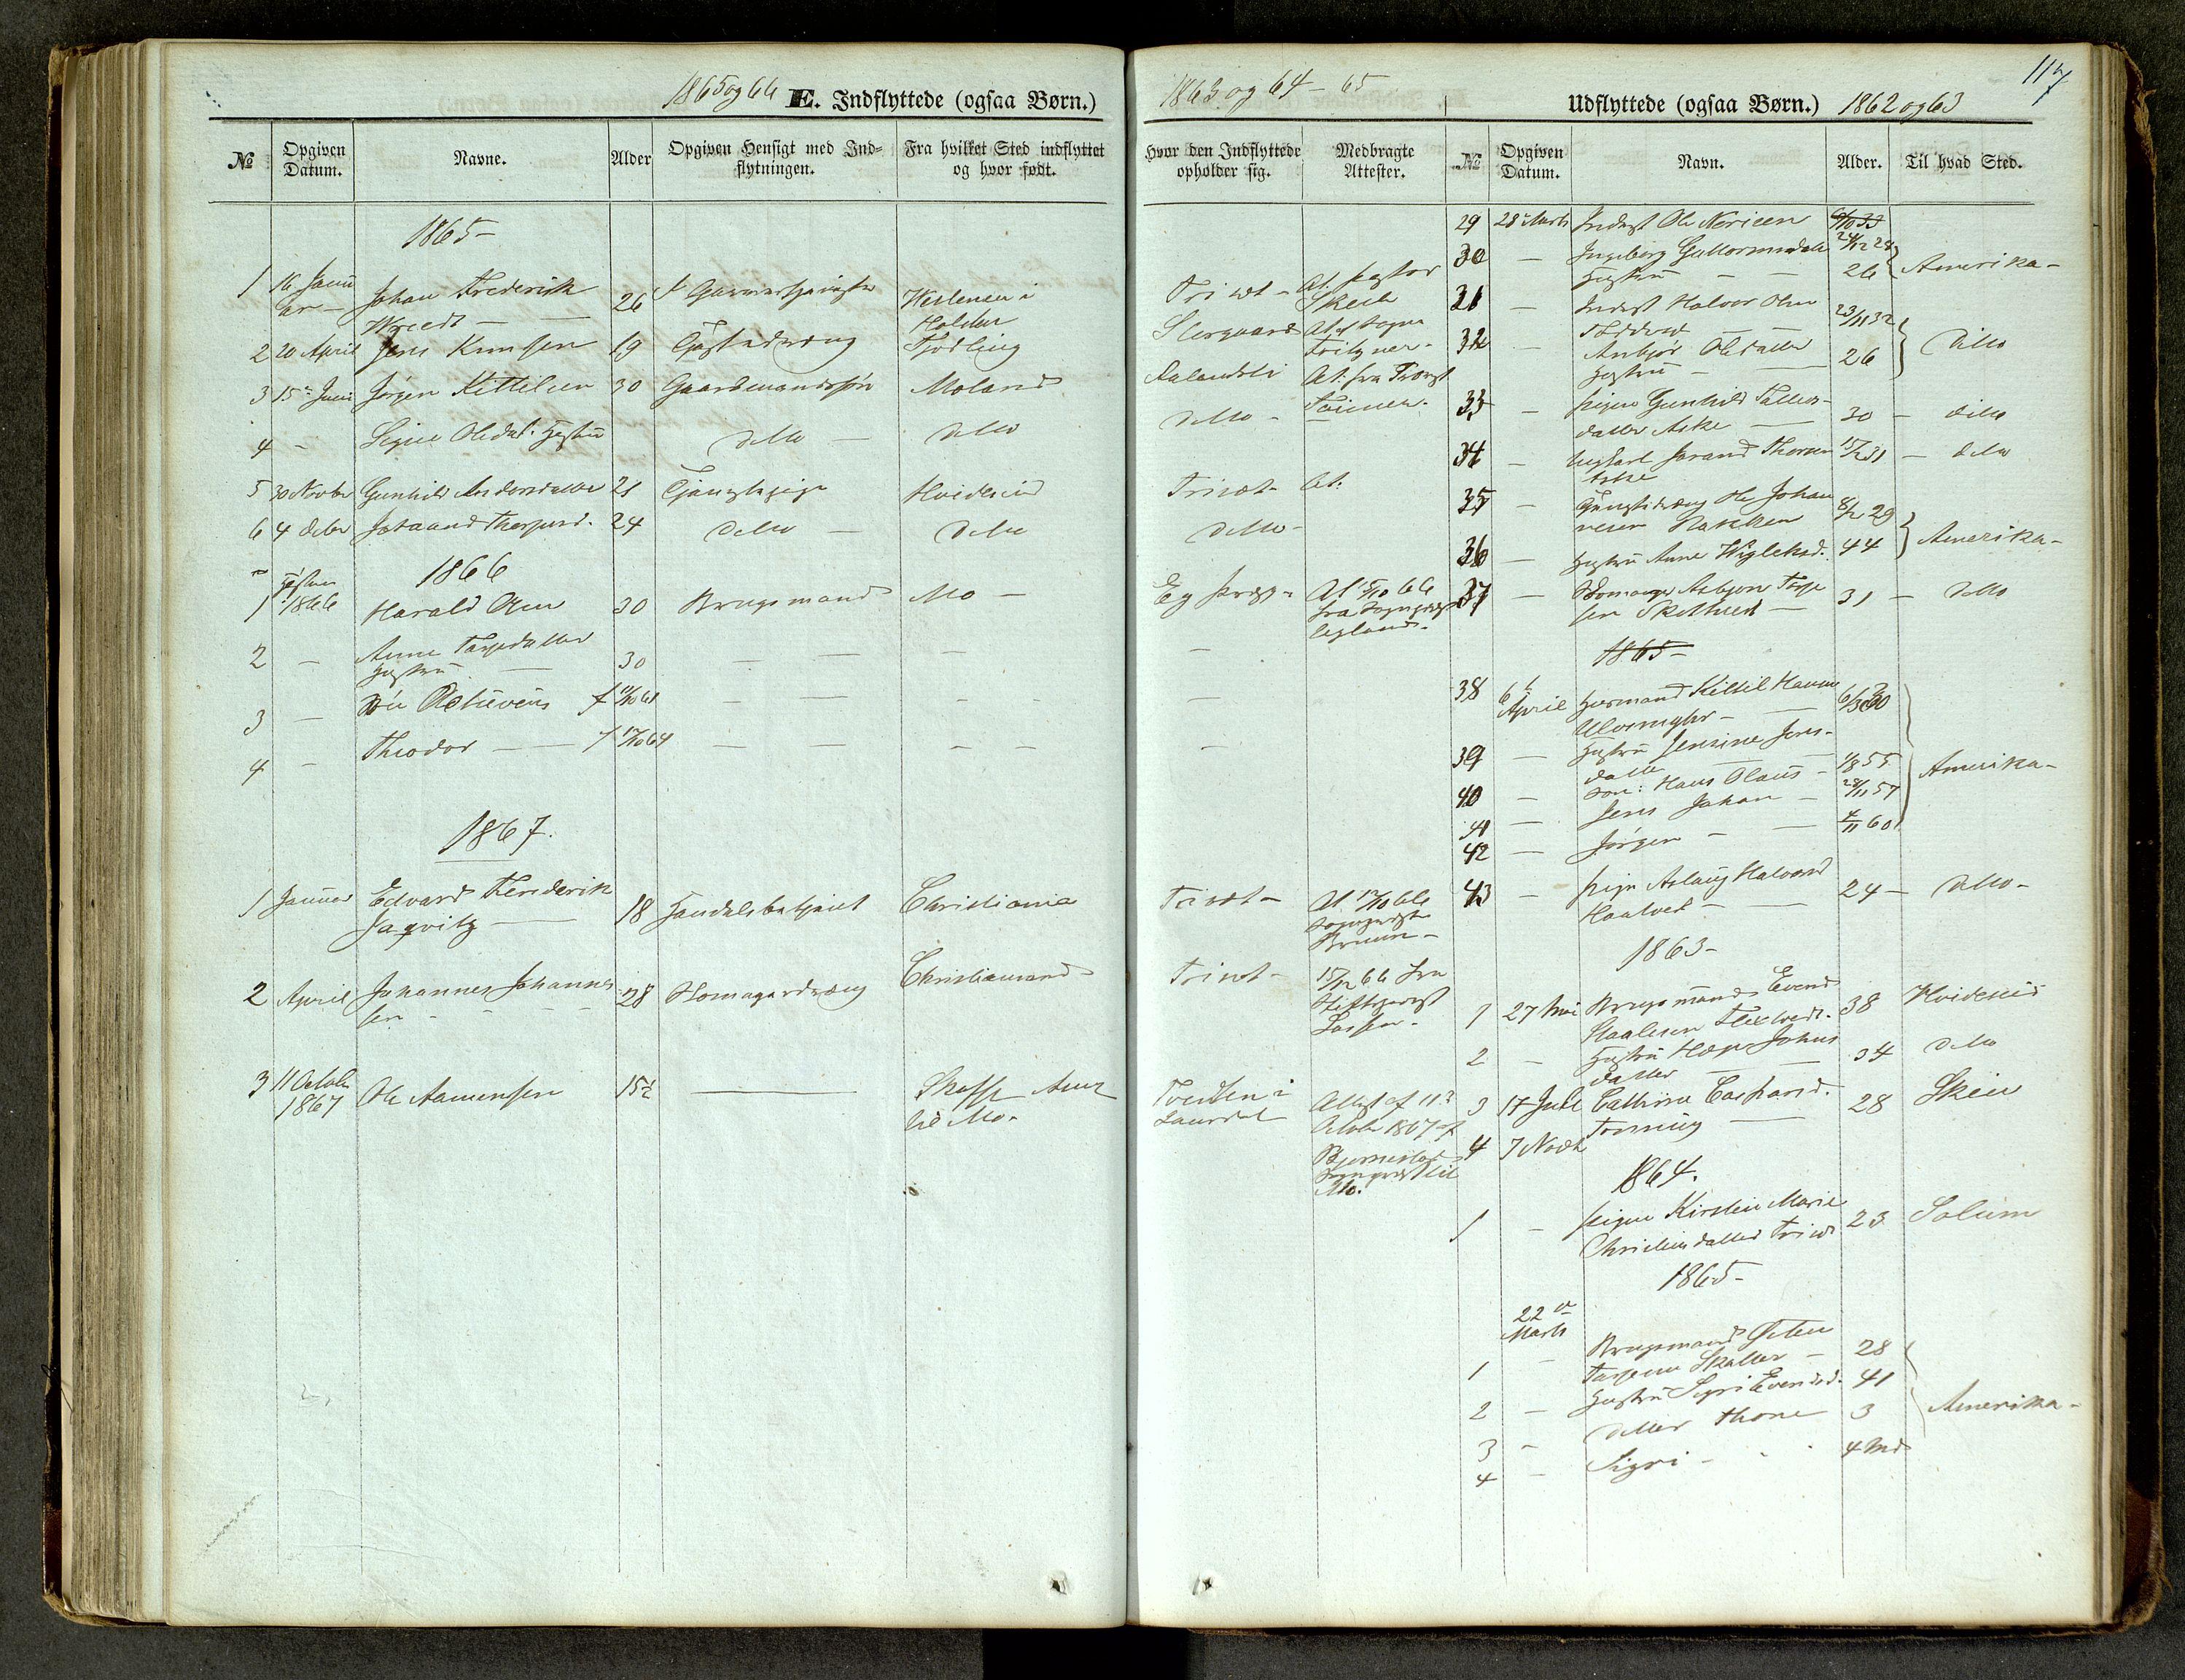 SAKO, Lårdal kirkebøker, G/Ga/L0002: Klokkerbok nr. I 2, 1861-1890, s. 117